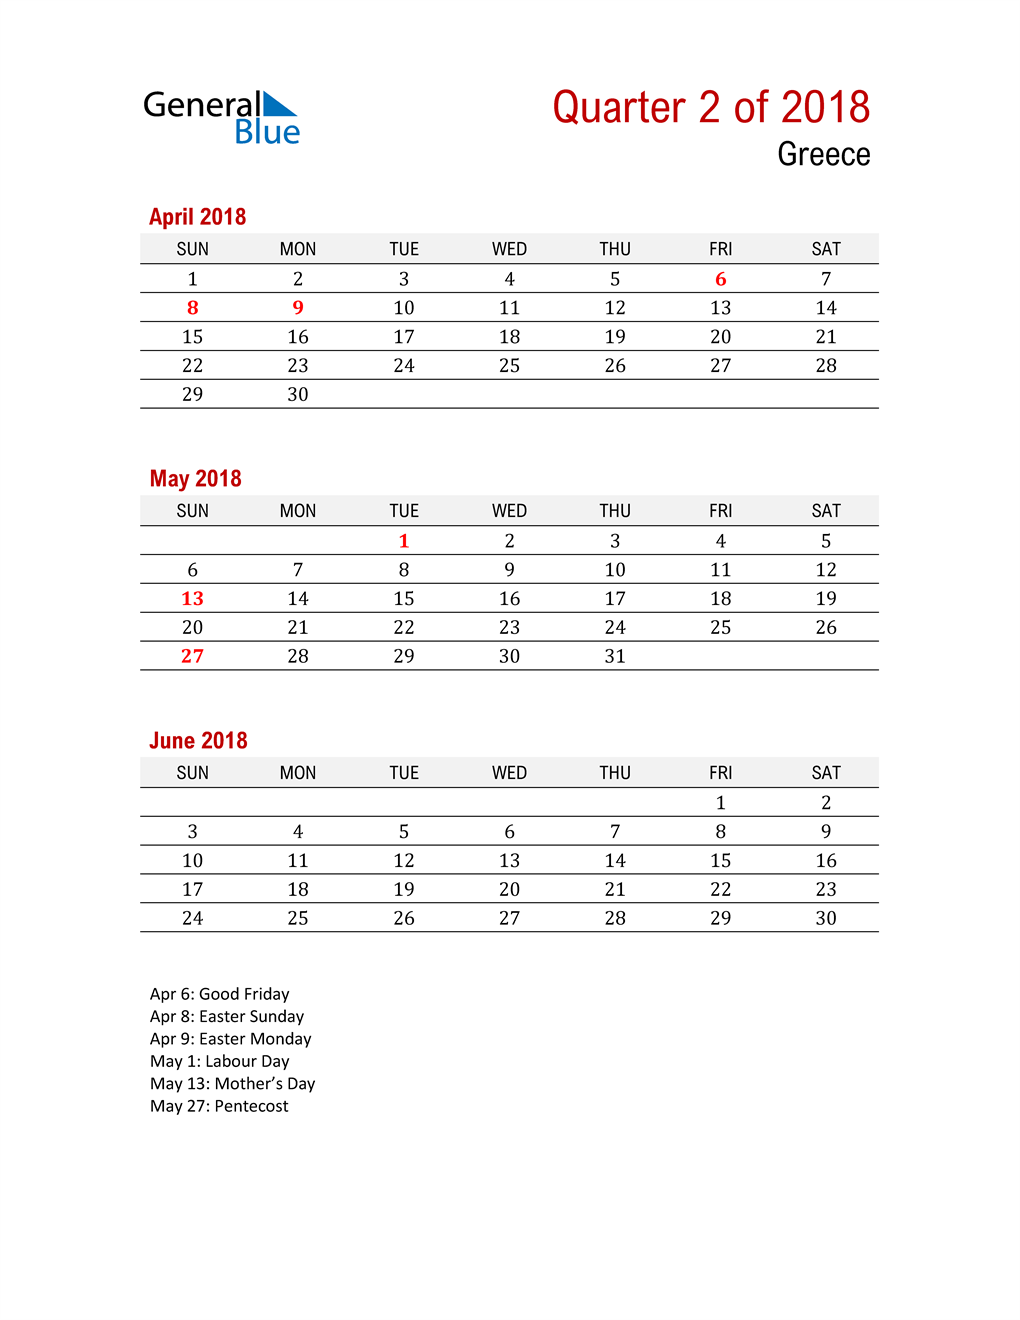 Printable Three Month Calendar for Greece